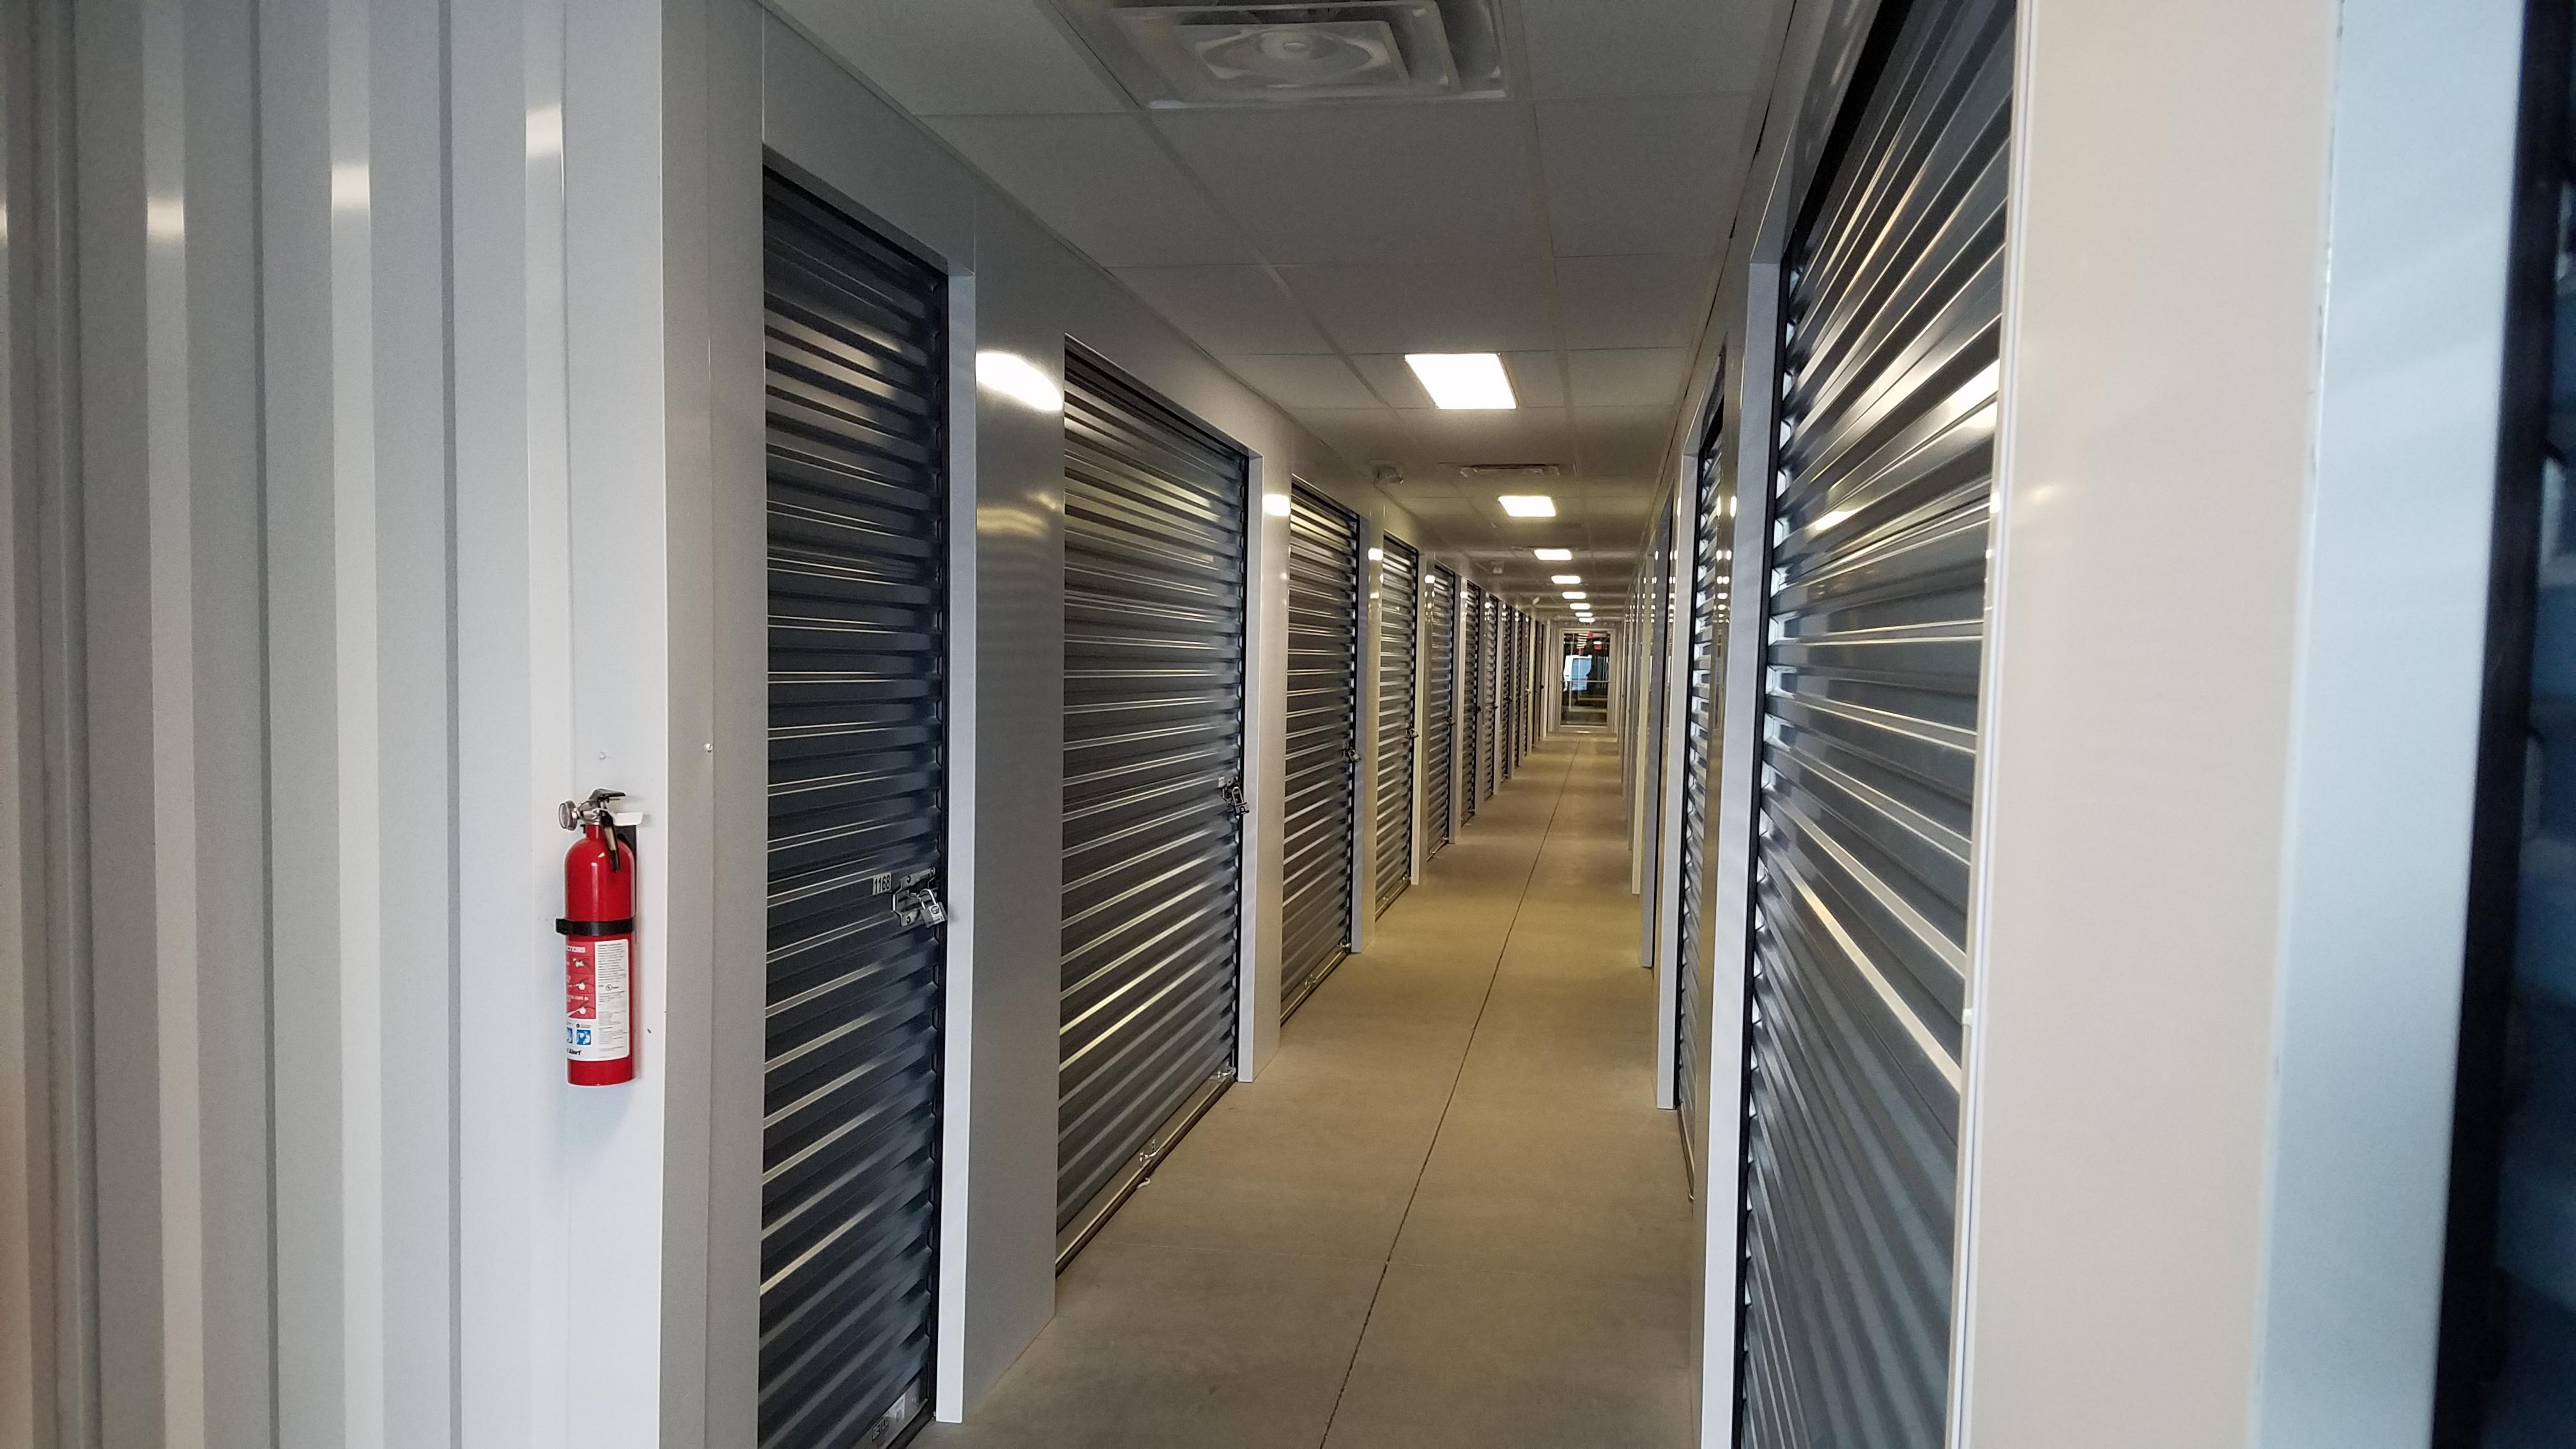 Interior storage climate control temperature control